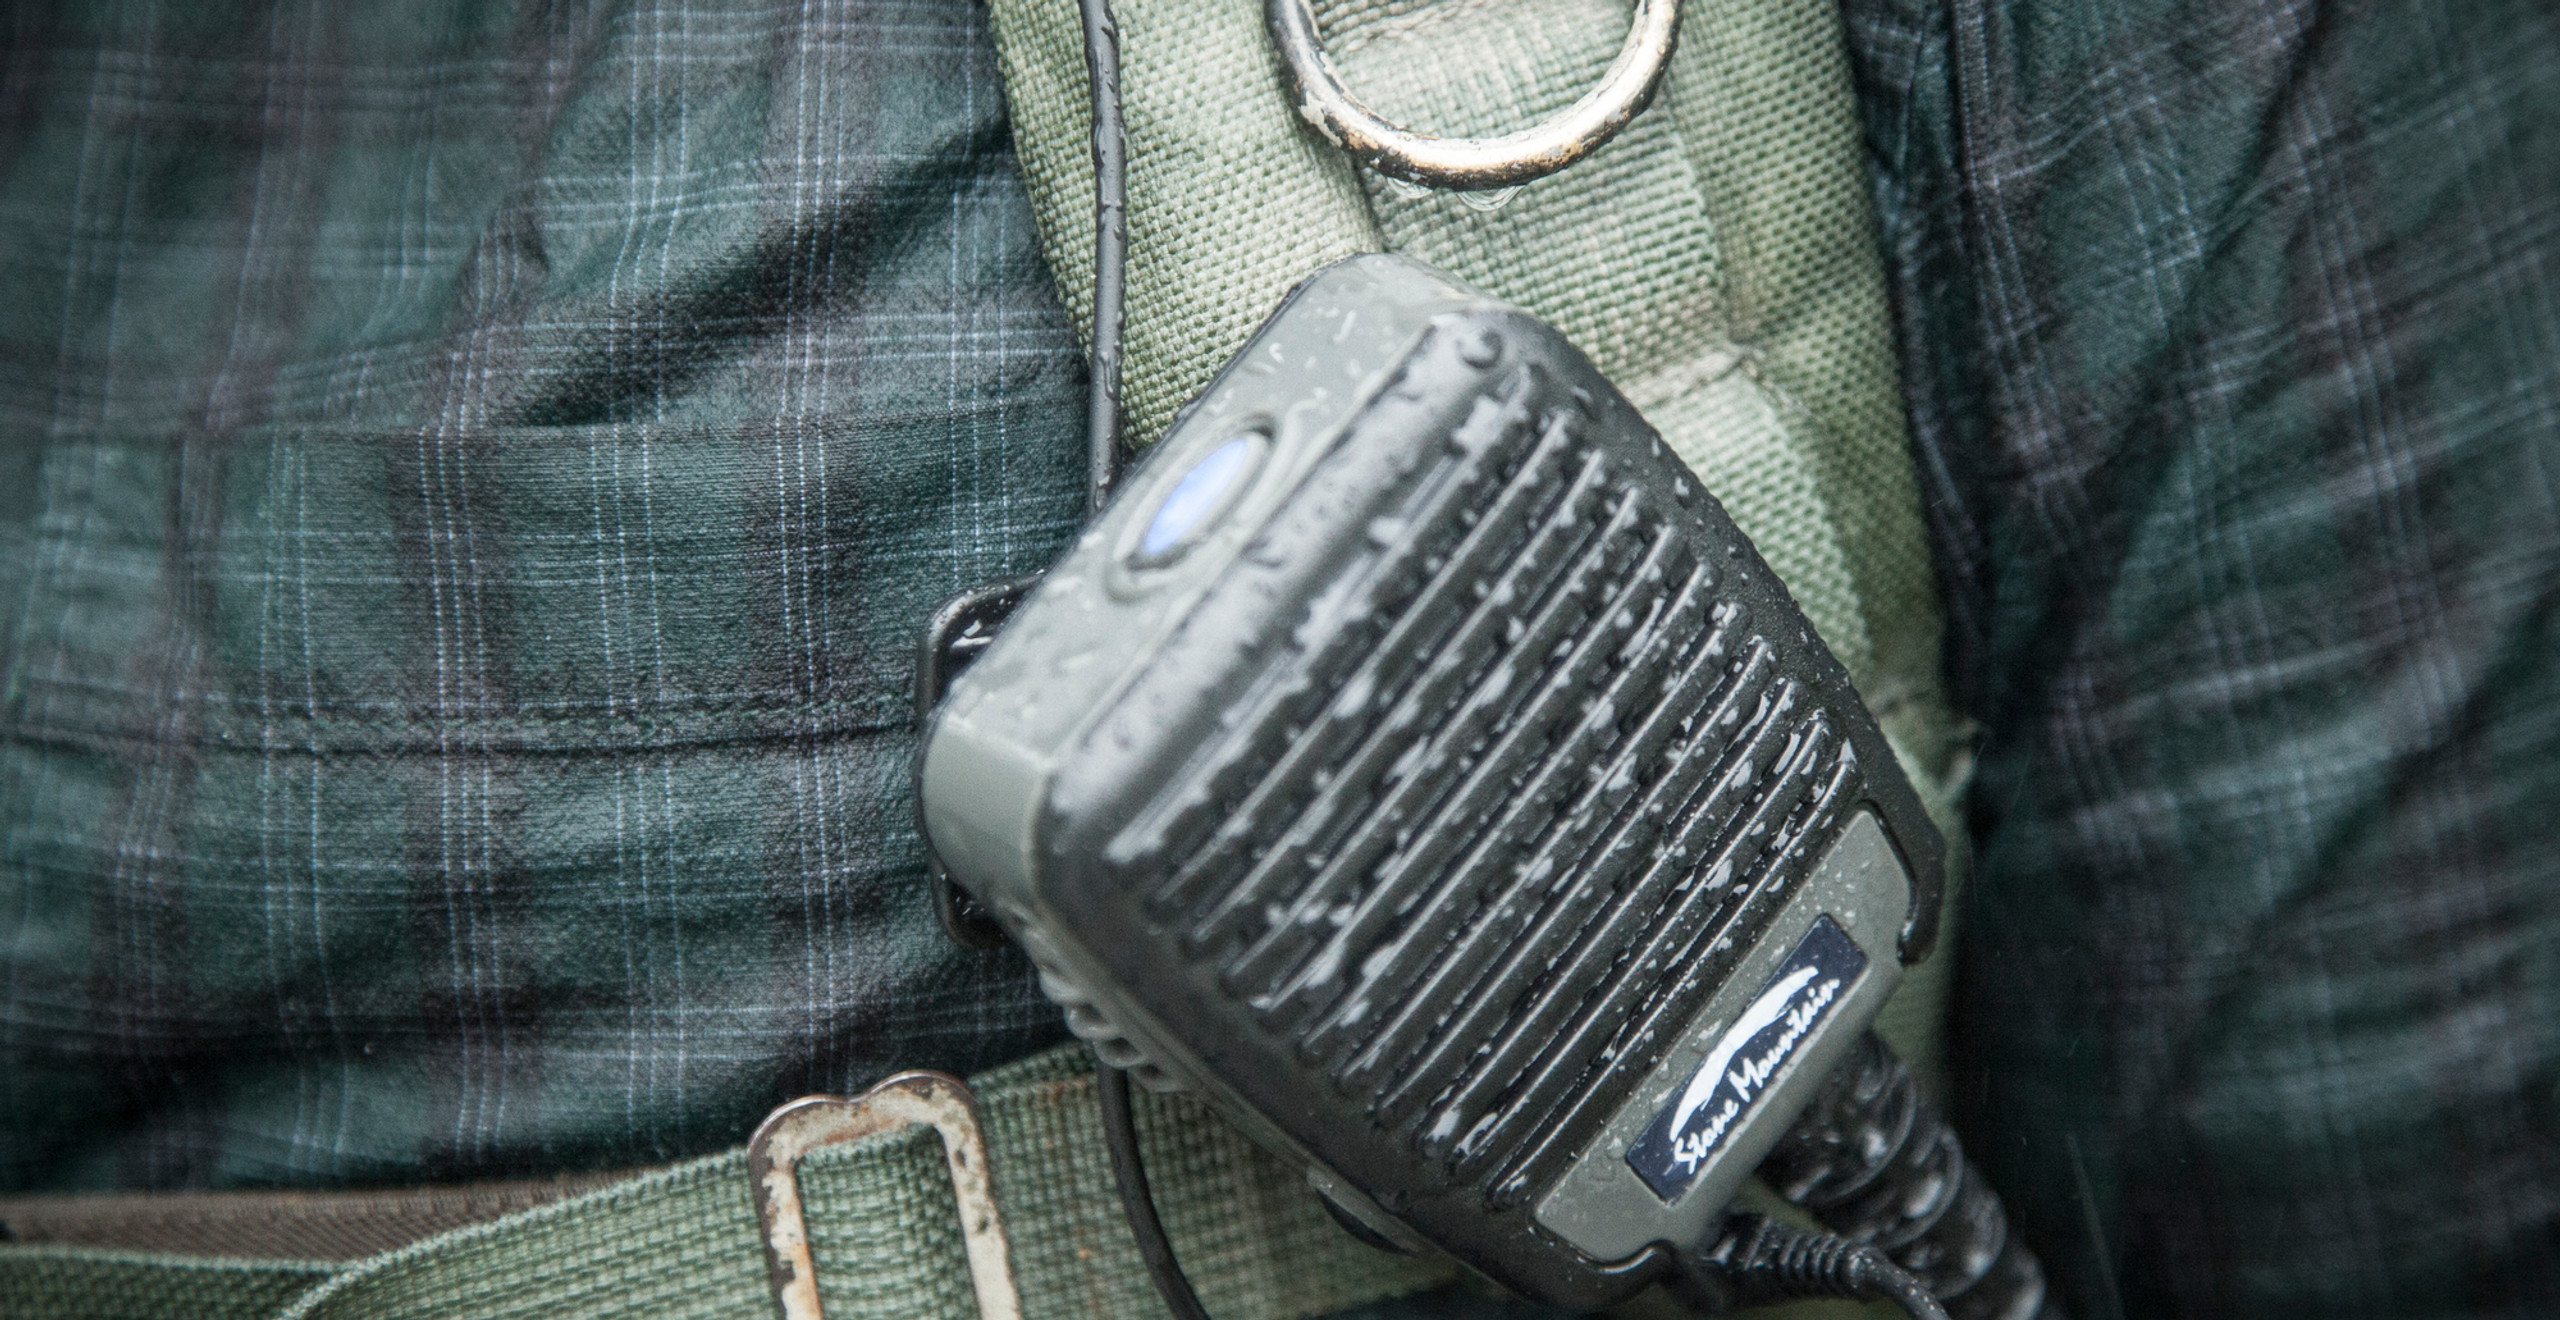 Stone Mountain Ltd Phoenix Elite PoC RSM speaker microphone Blackline simulations airsoft military simulations tactical zello accessories review waterproof